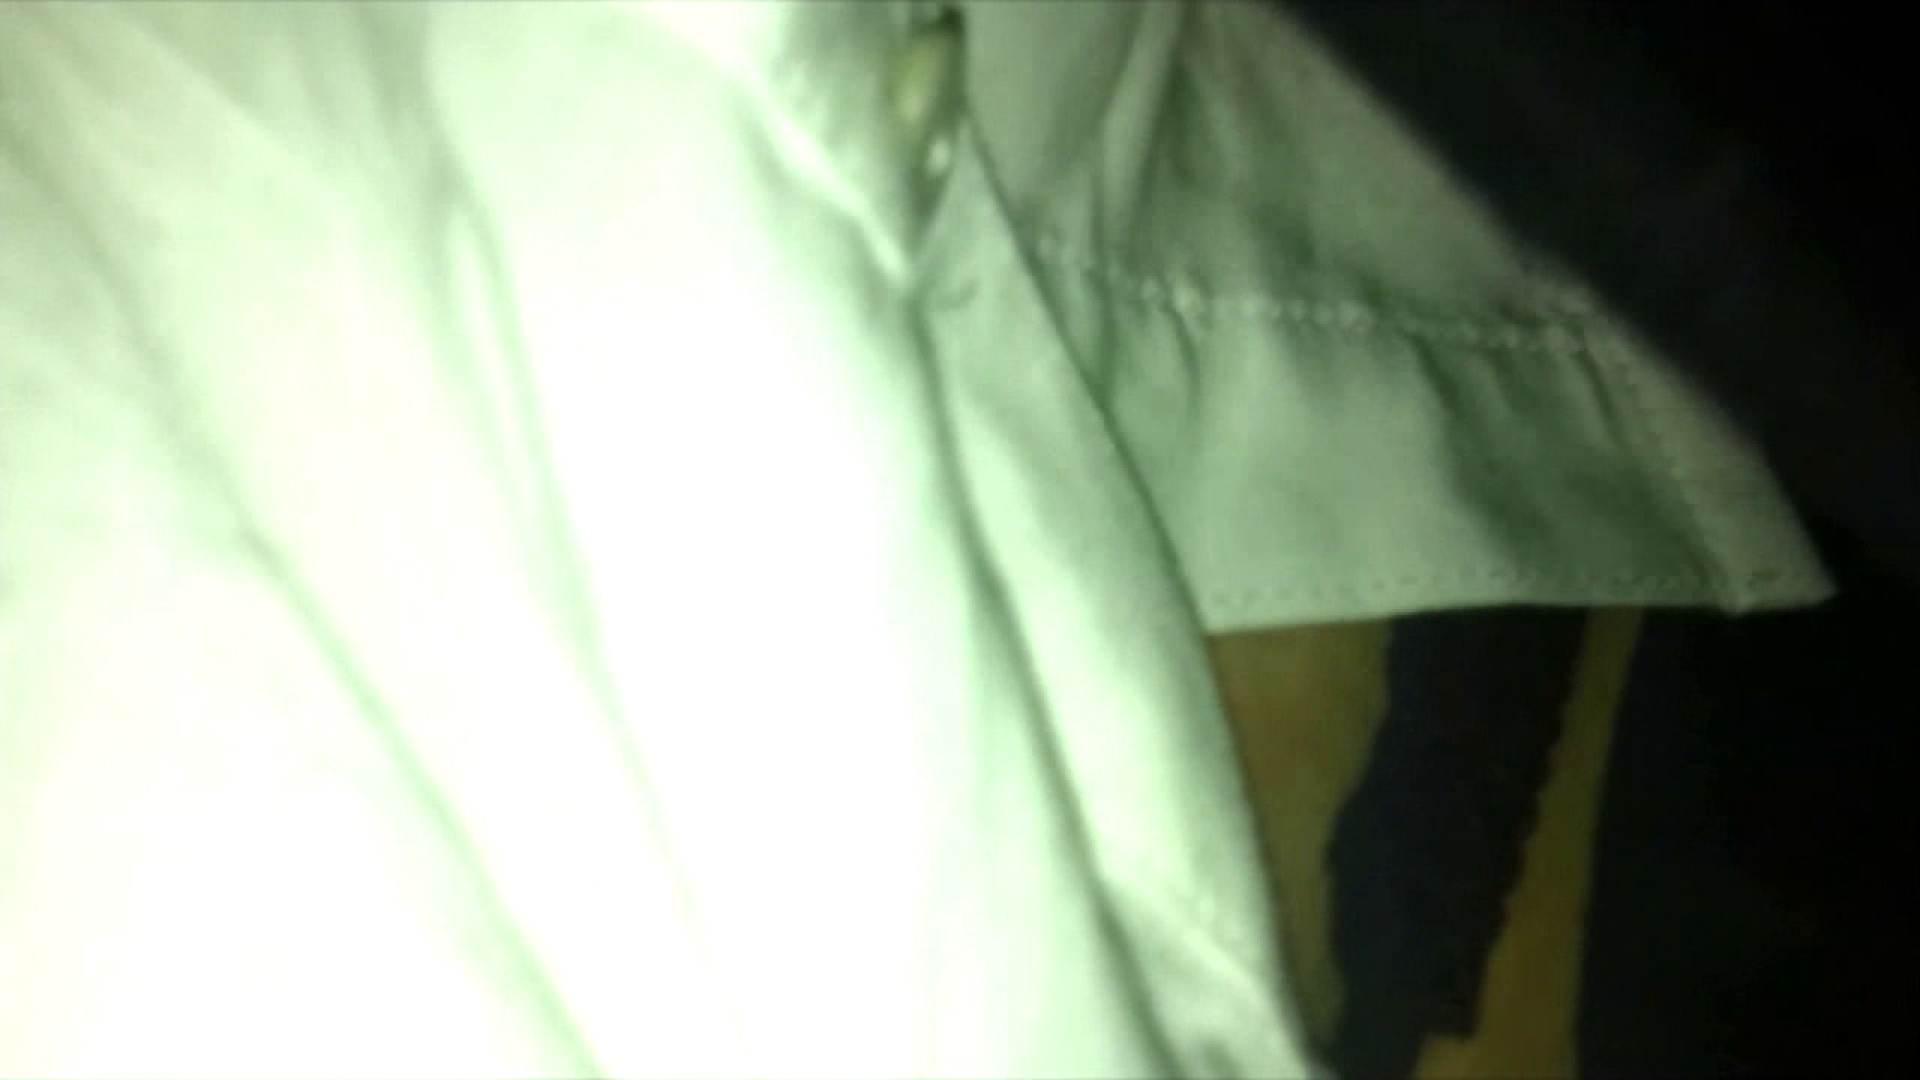 vol.22 【YHちゃん】パルコ店員20歳 mixiオフ会で いじくり オメコ動画キャプチャ 69画像 27